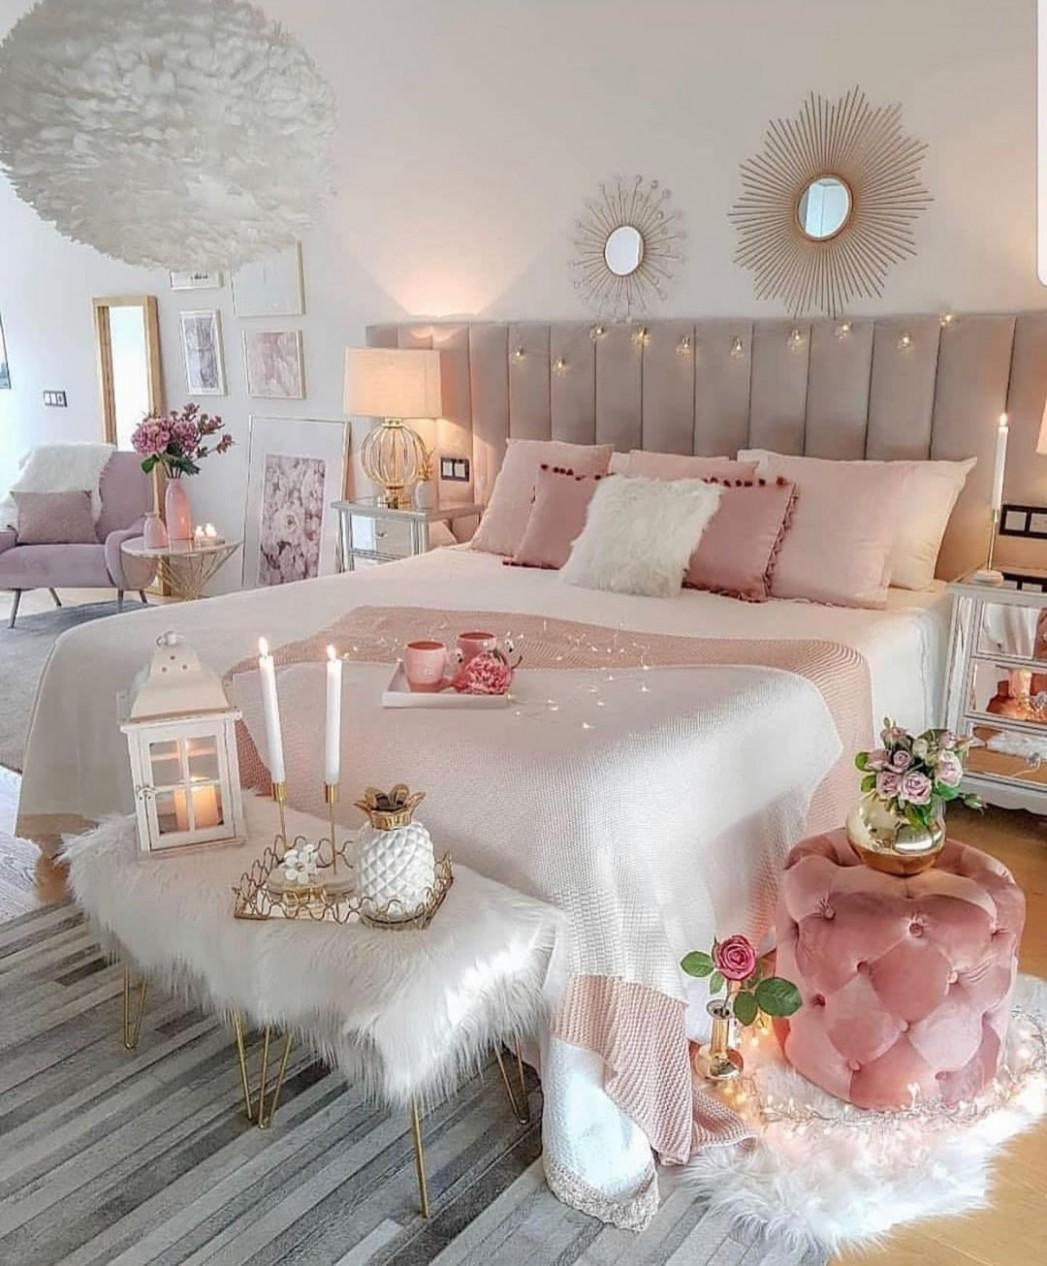 "Olivia Jent on Instagram: ""Bedroom goals 🙌🏼 YAY or NAY  - Bedroom Ideas Instagram"